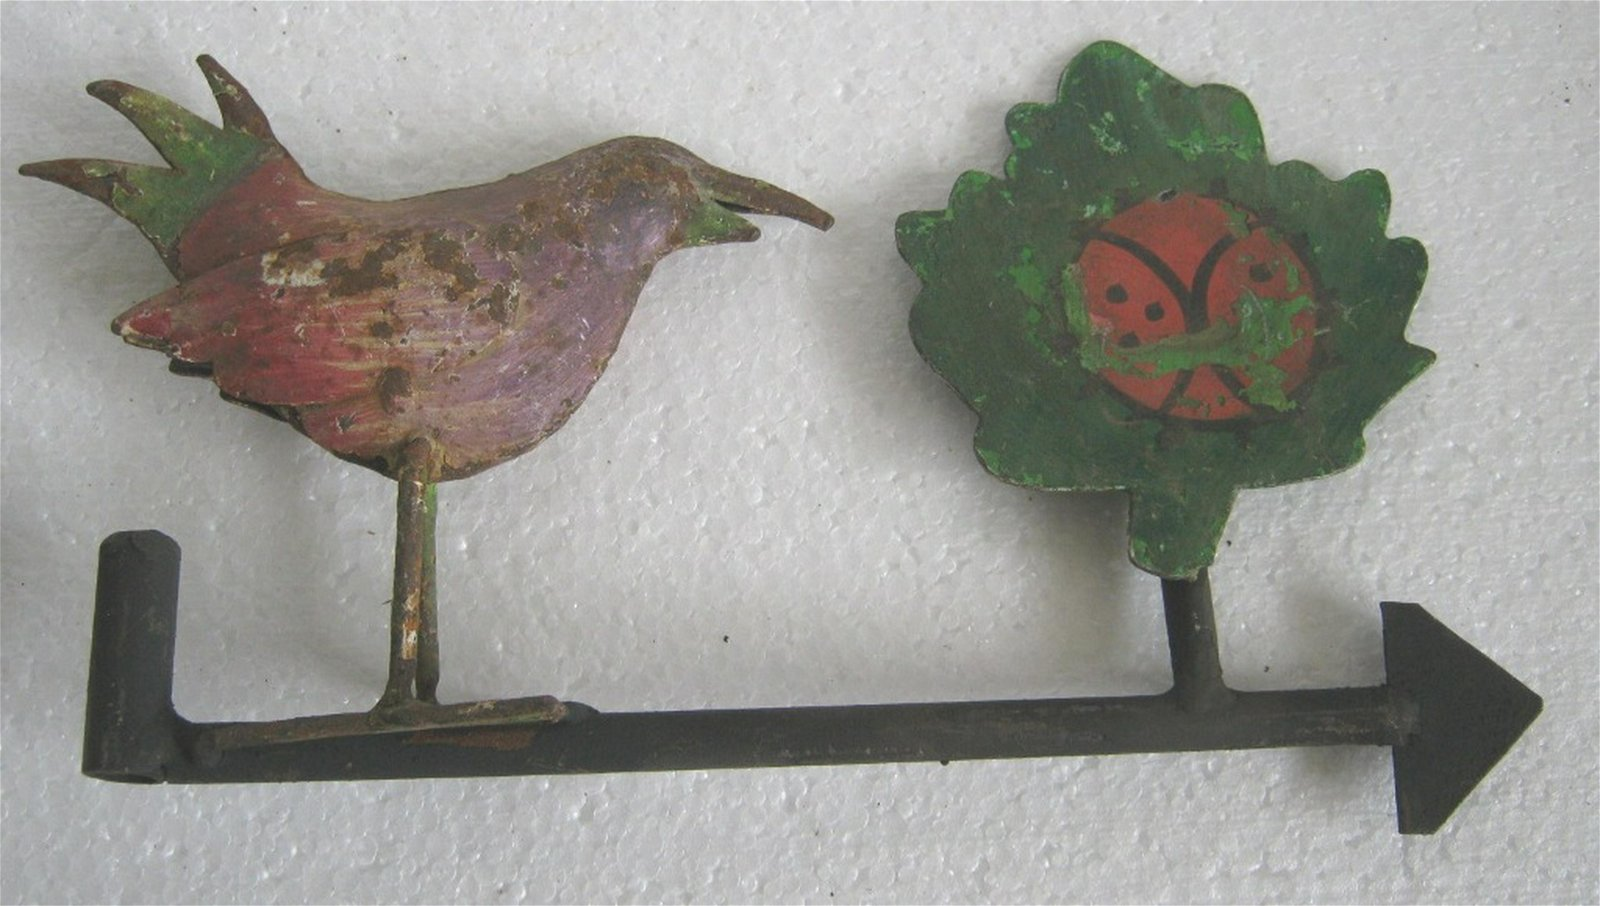 Iron bird and tree weather vane